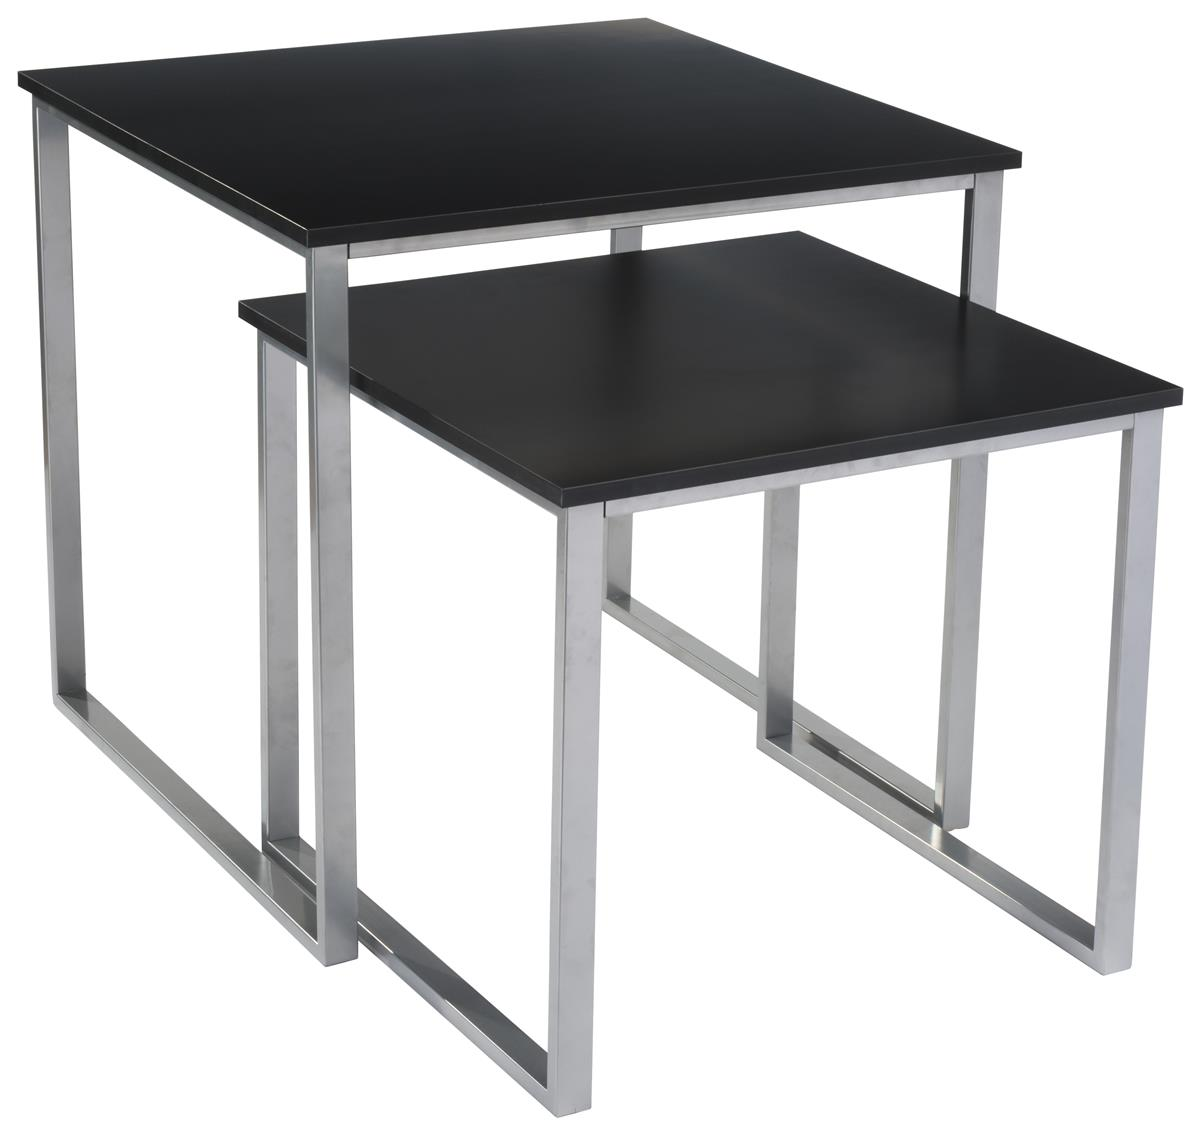 Set Of 2 Square Design Nesting Coffee Tables Made Of Black: Contemporary Nesting Tables